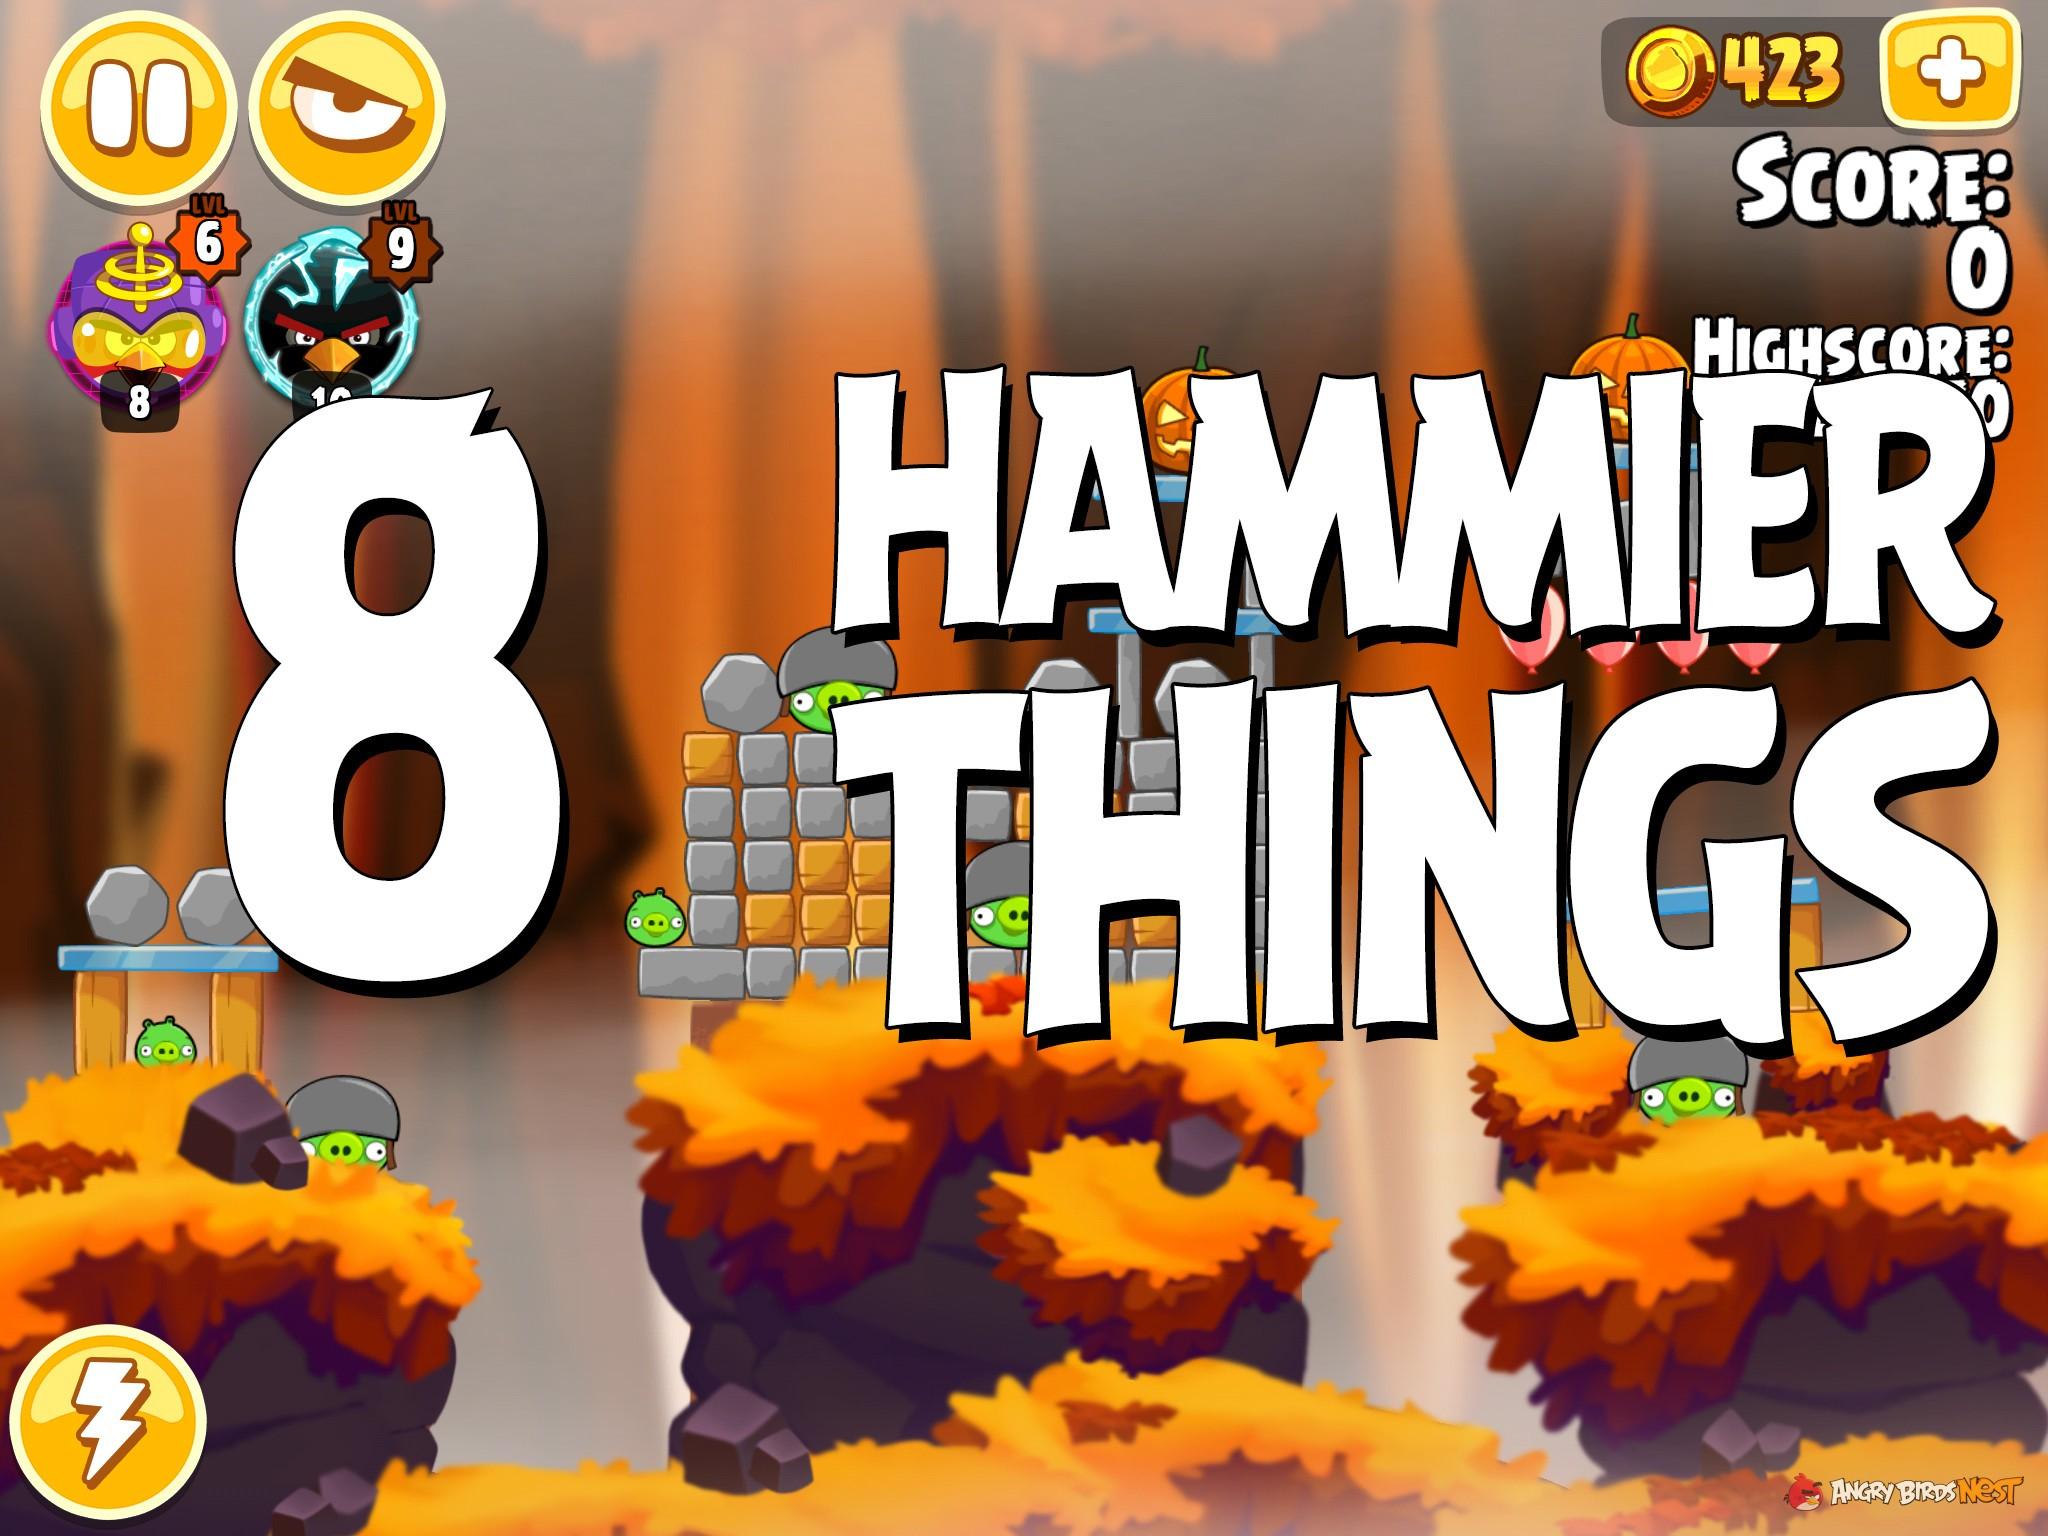 Angry Birds Hammier Things angry birds seasons hammier things level 1-8 walkthrough